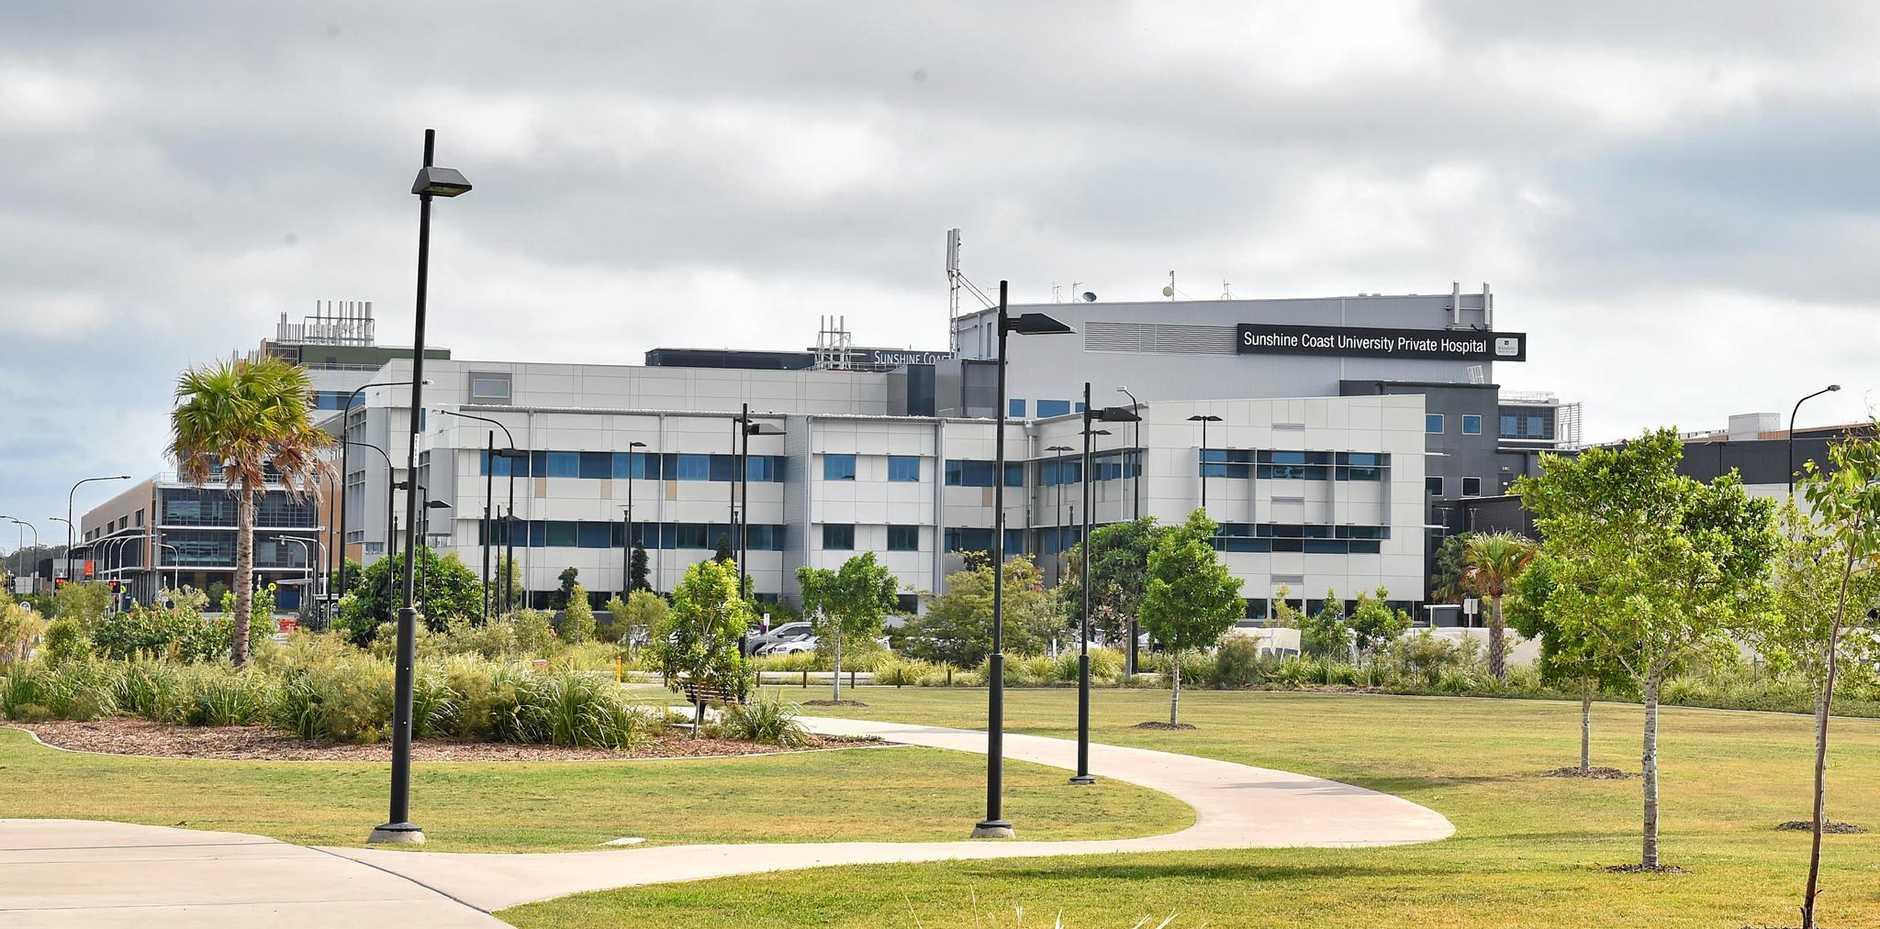 Sunshine Coast University Private Hospital.